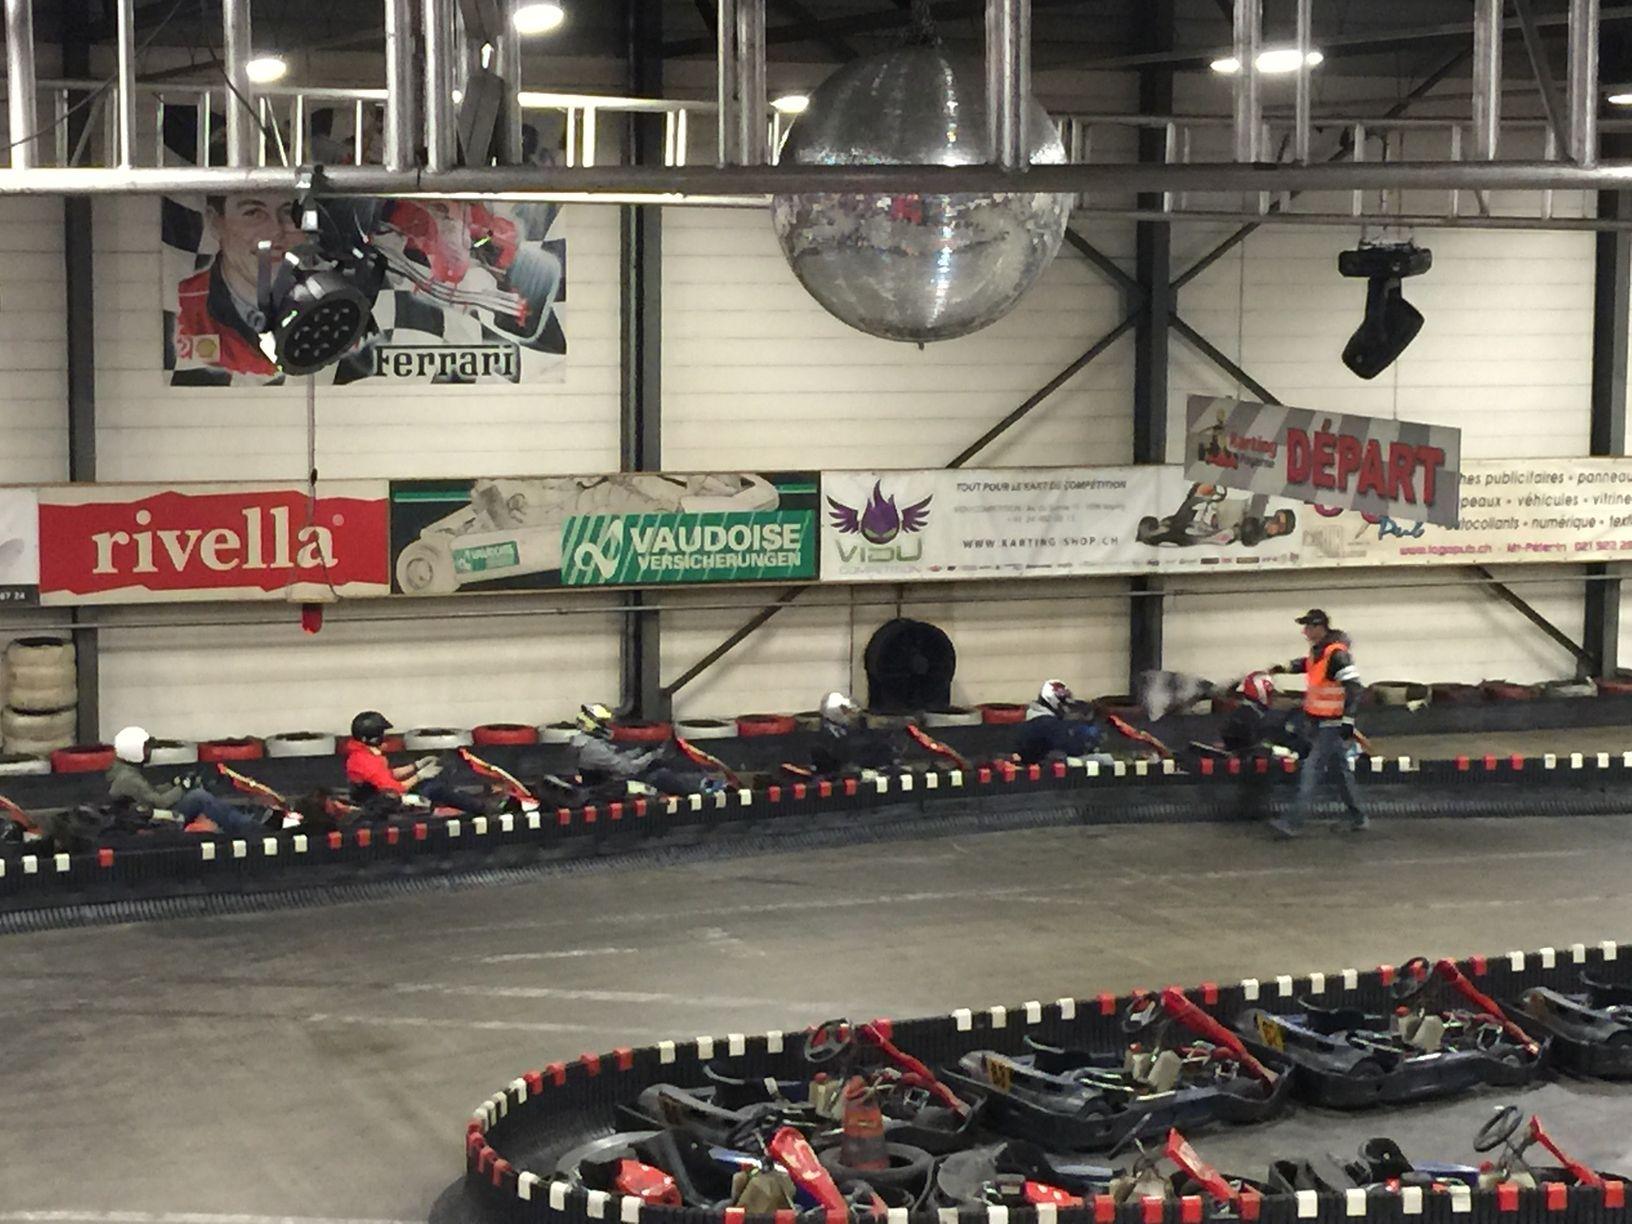 20141206_Karting-017.JPG